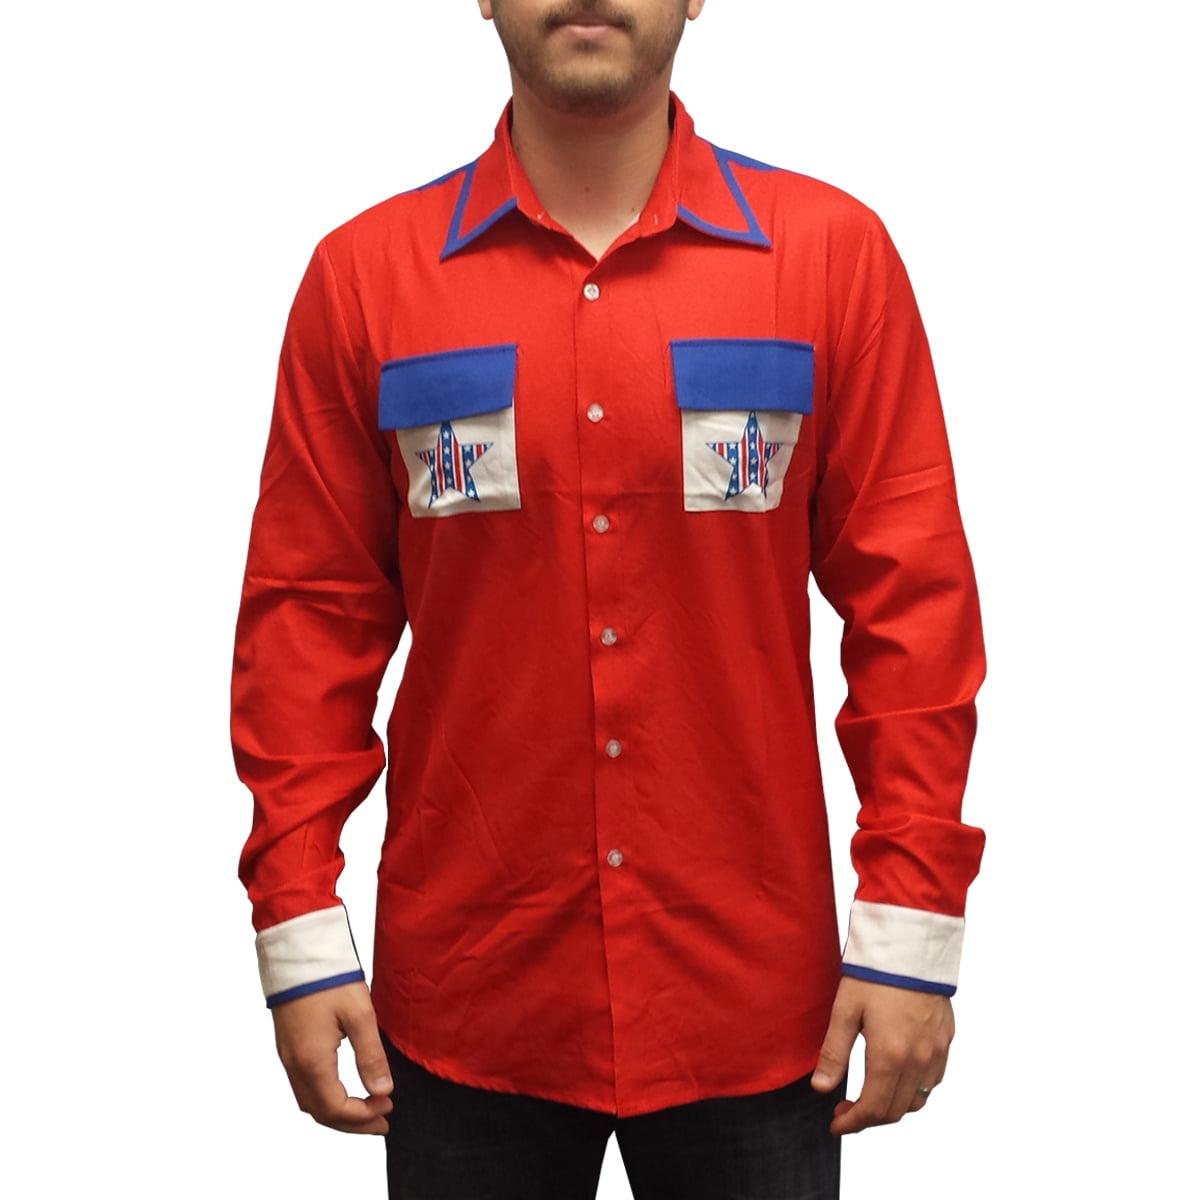 roy munson bowling shirt kingpin movie king pin costume woody